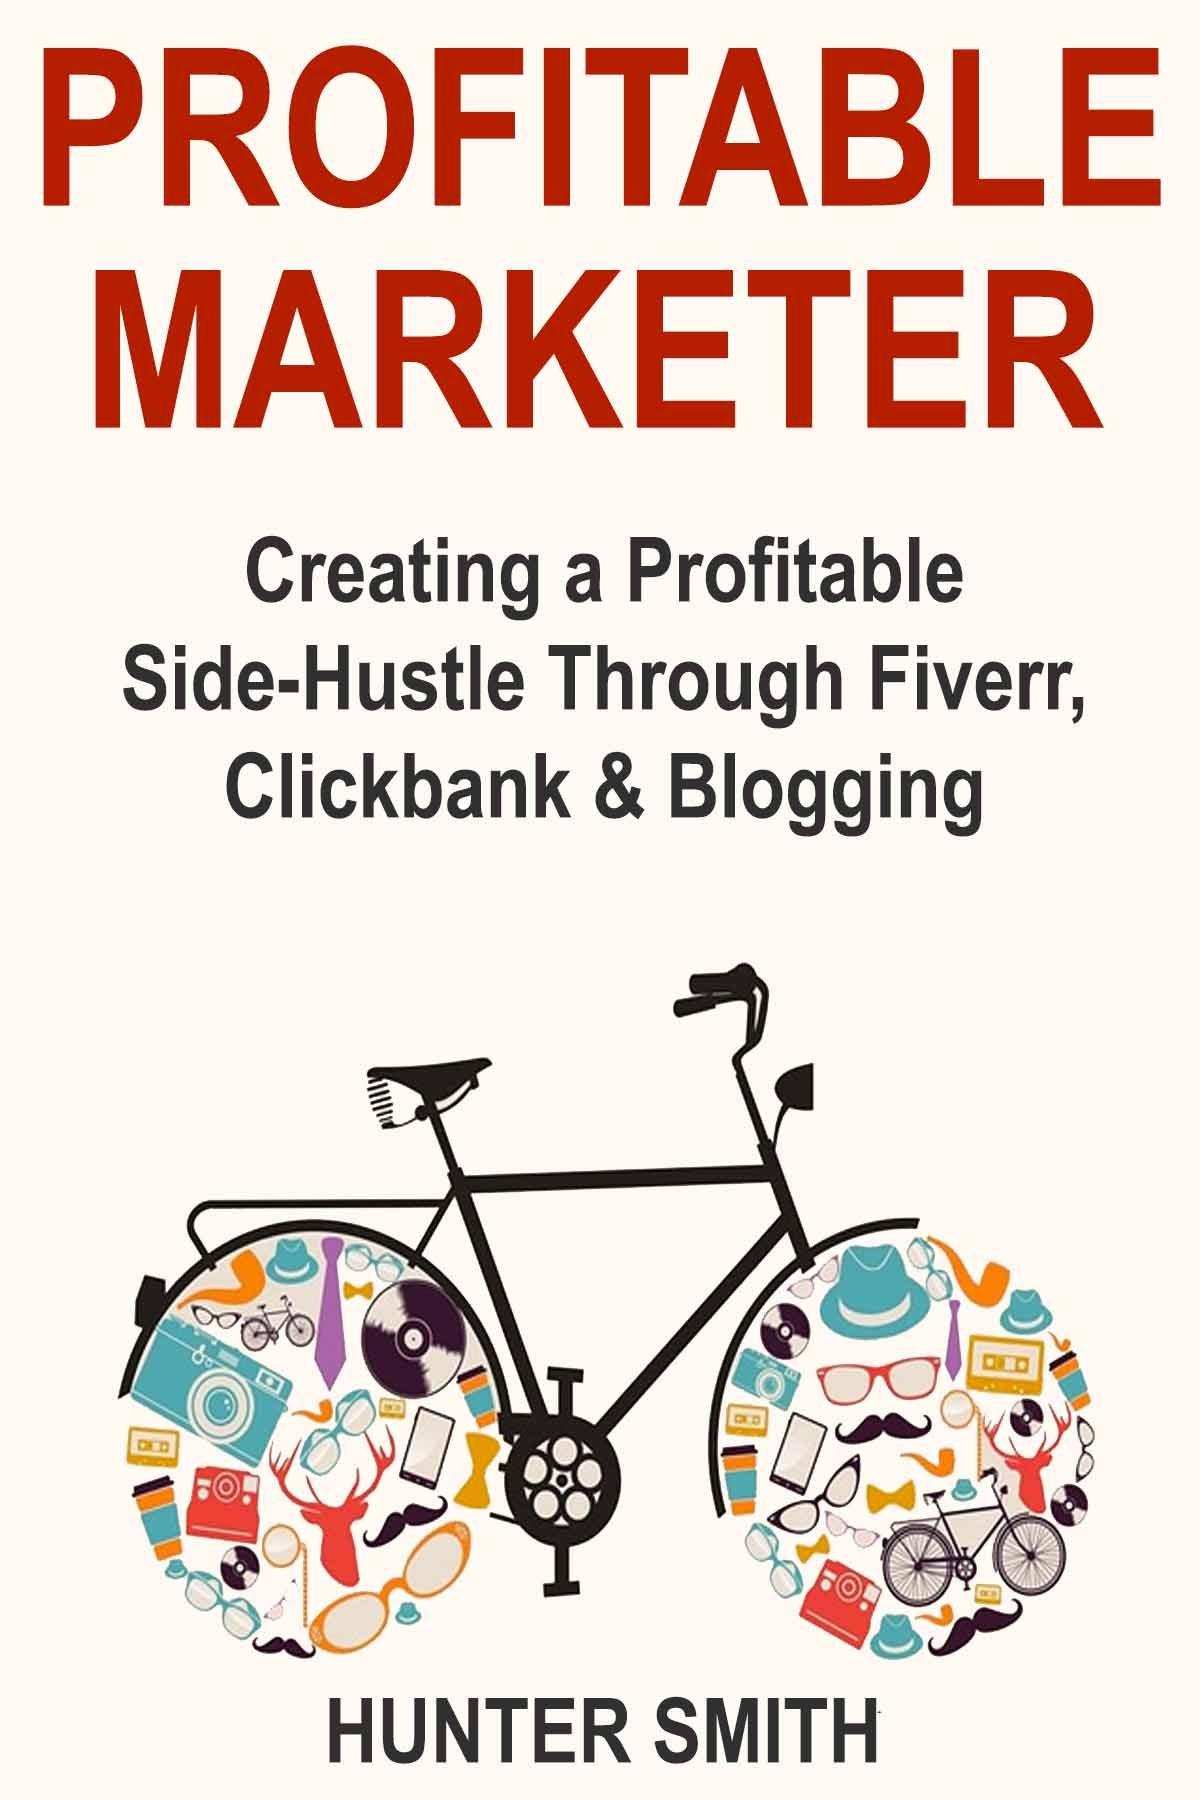 Profitable Marketer: Creating a Profitable Side-Hustle Through Fiverr, Clickbank & Blogging